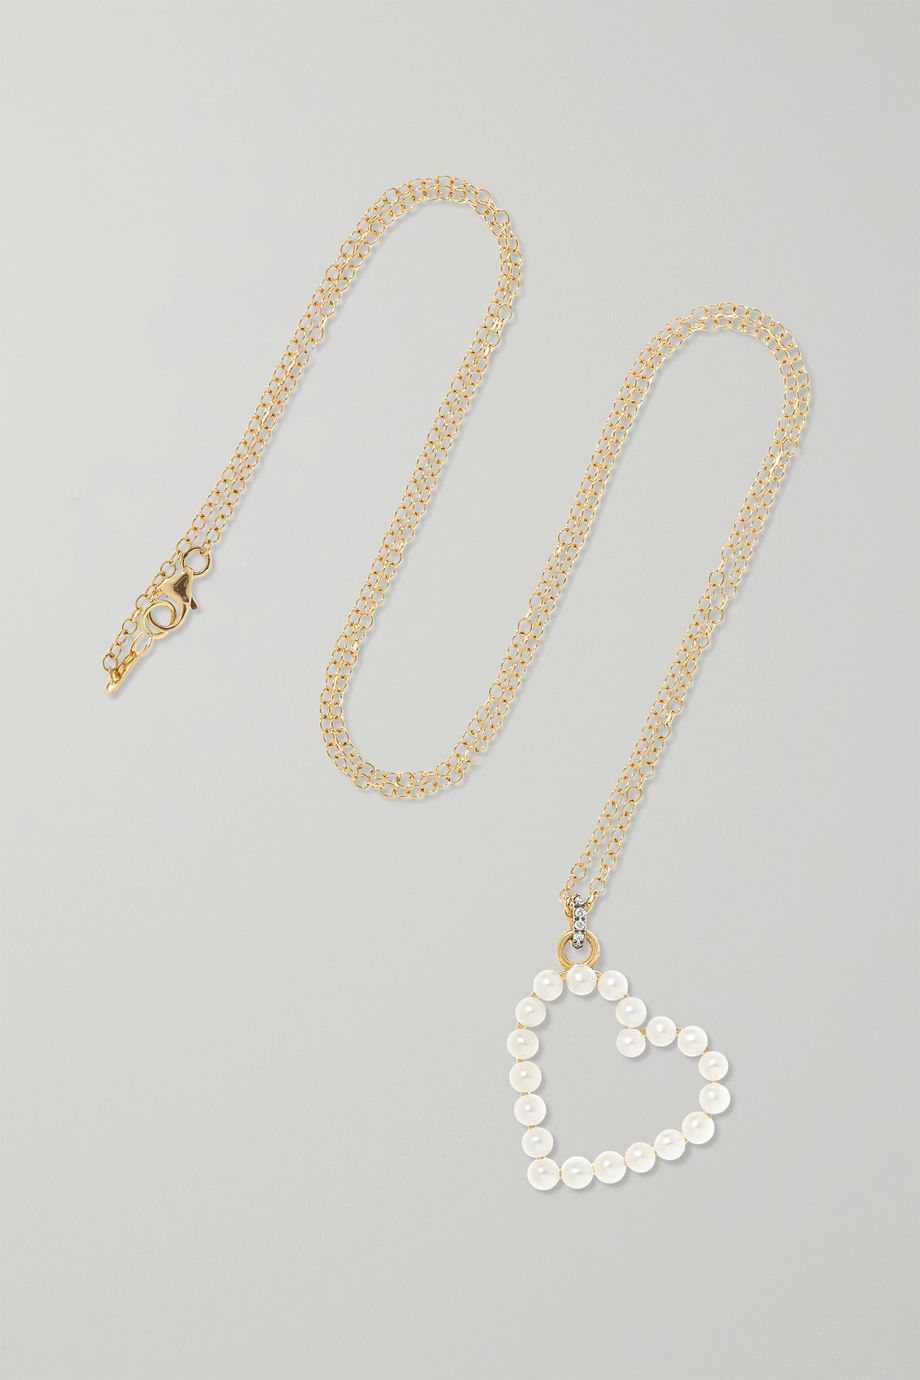 Jemma Wynne 18-karat gold, diamond and pearl necklace